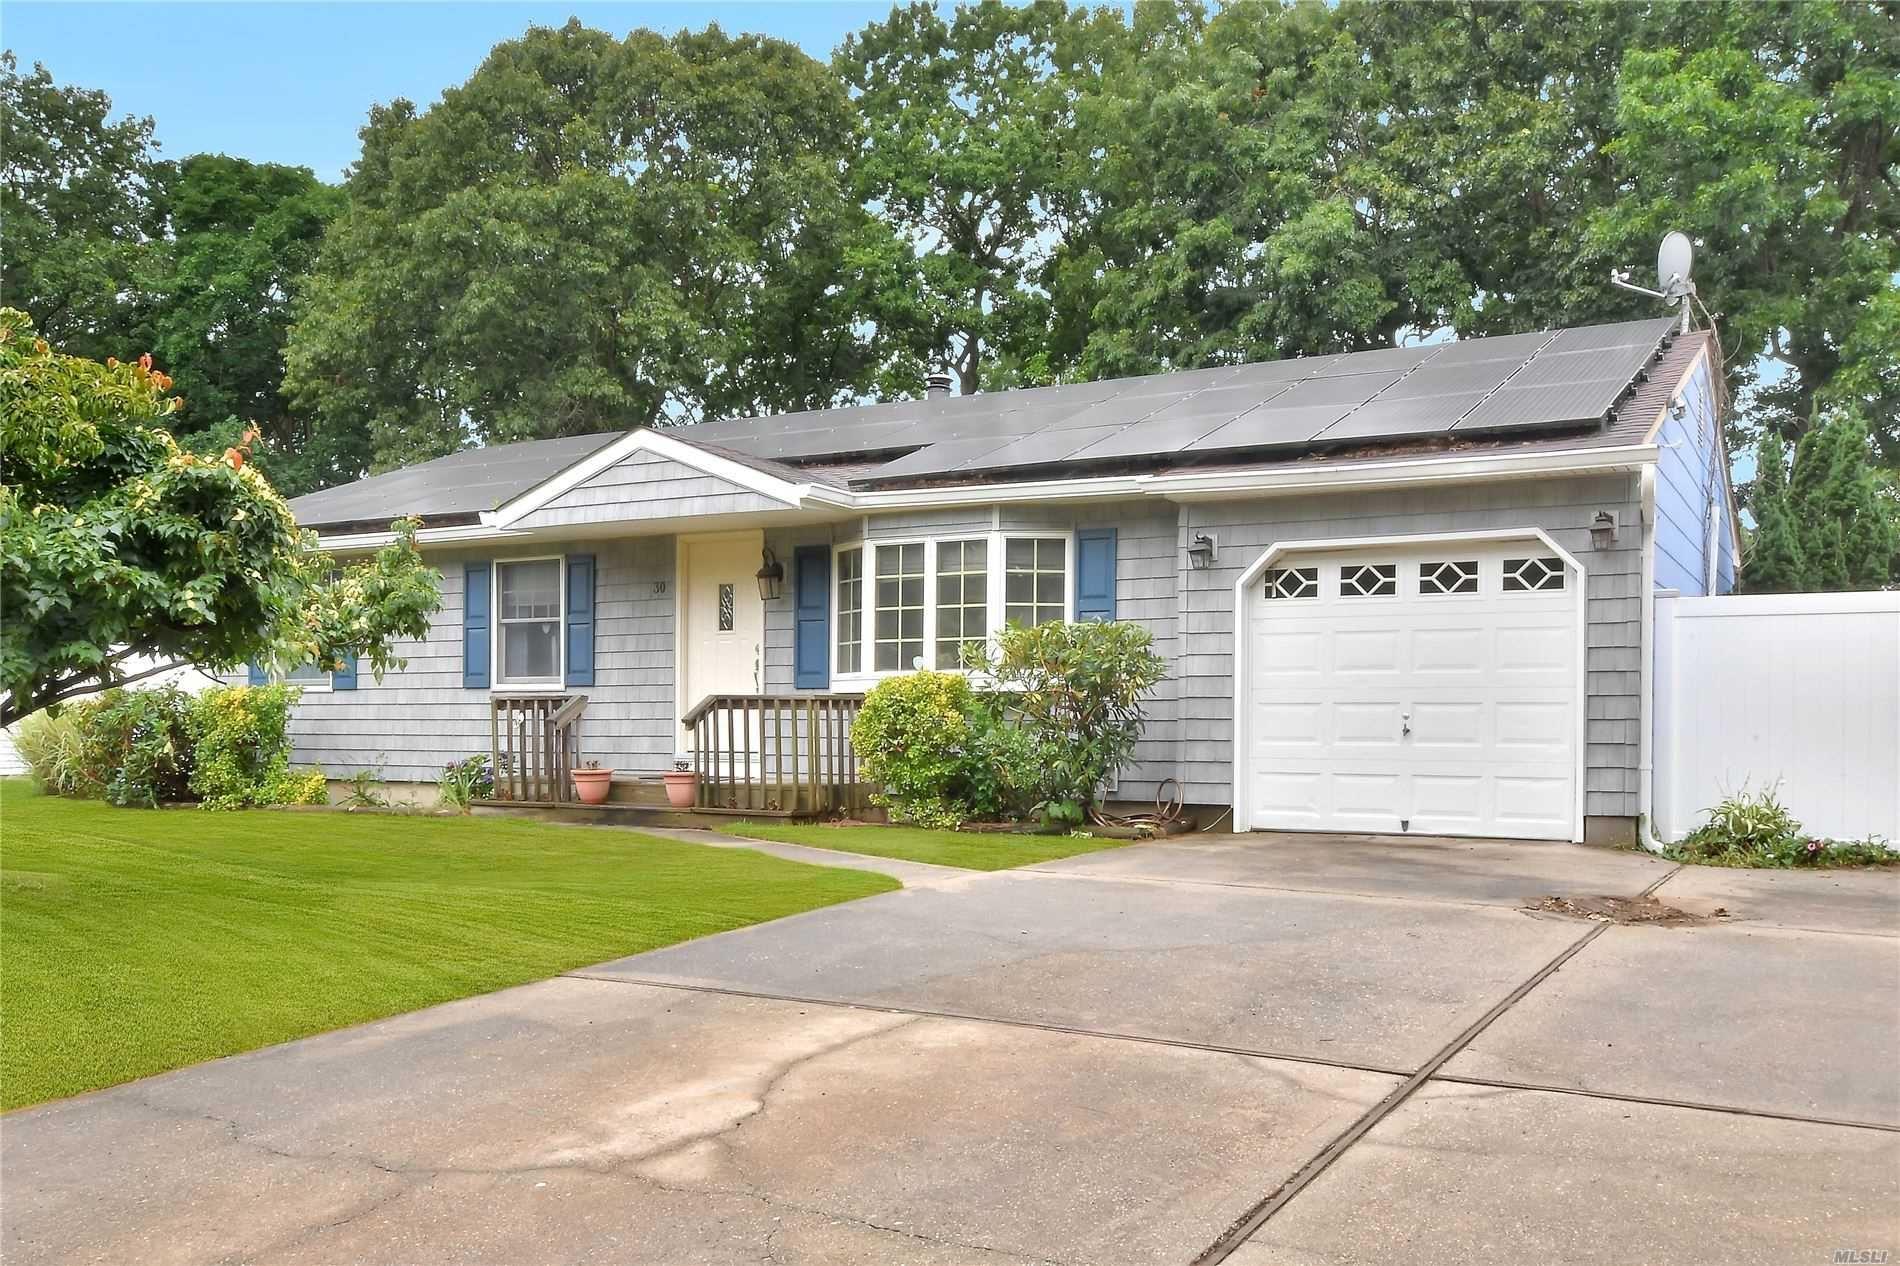 30 Cedar Ridge Drive, Ridge, NY 11961 - MLS#: 3236985